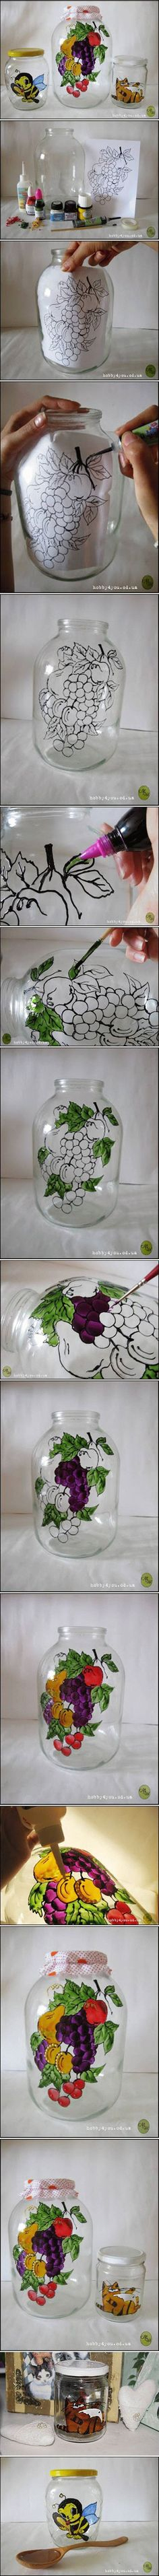 DIY Jar Painting Decor